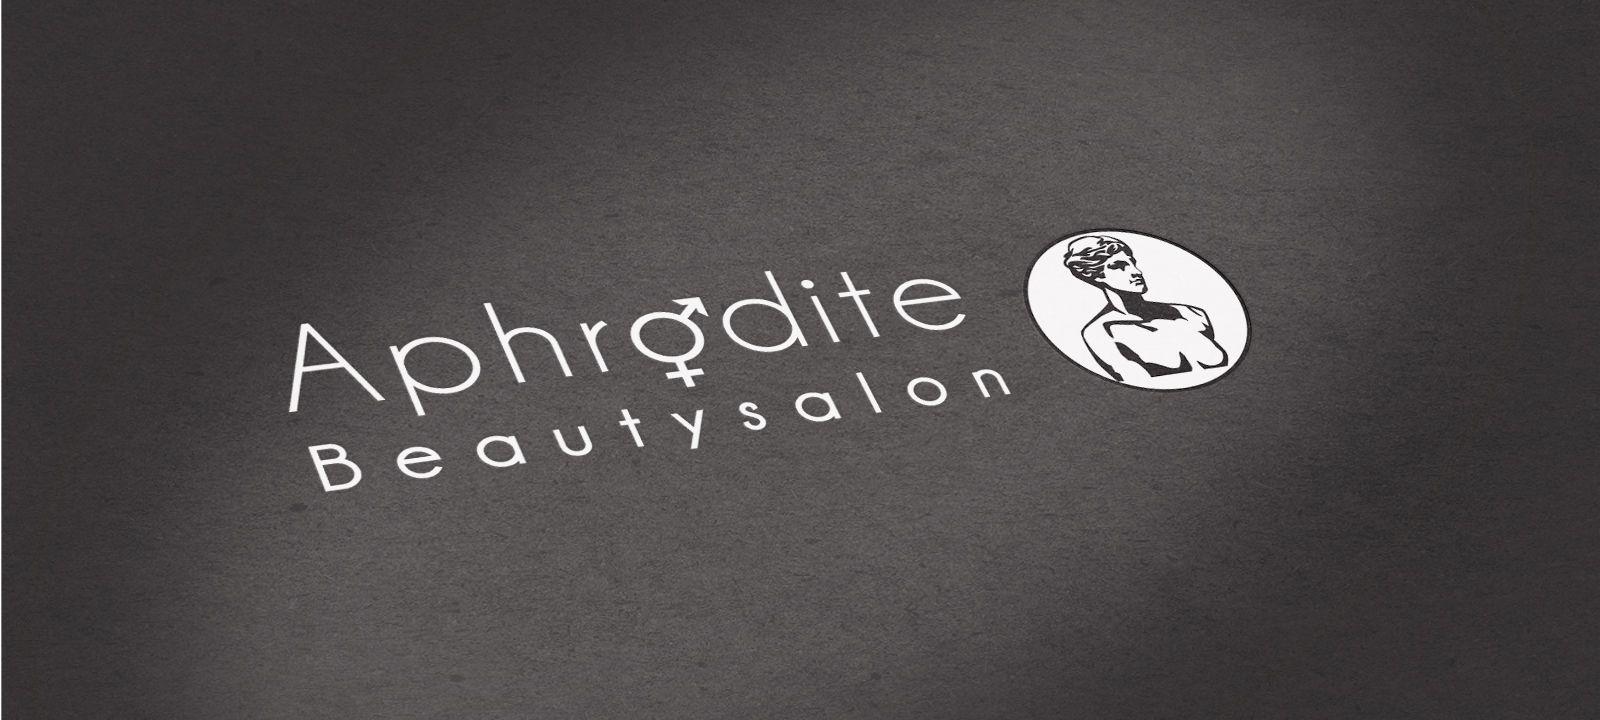 Beauty salon Aphrodite #schoonheidsalon #logo